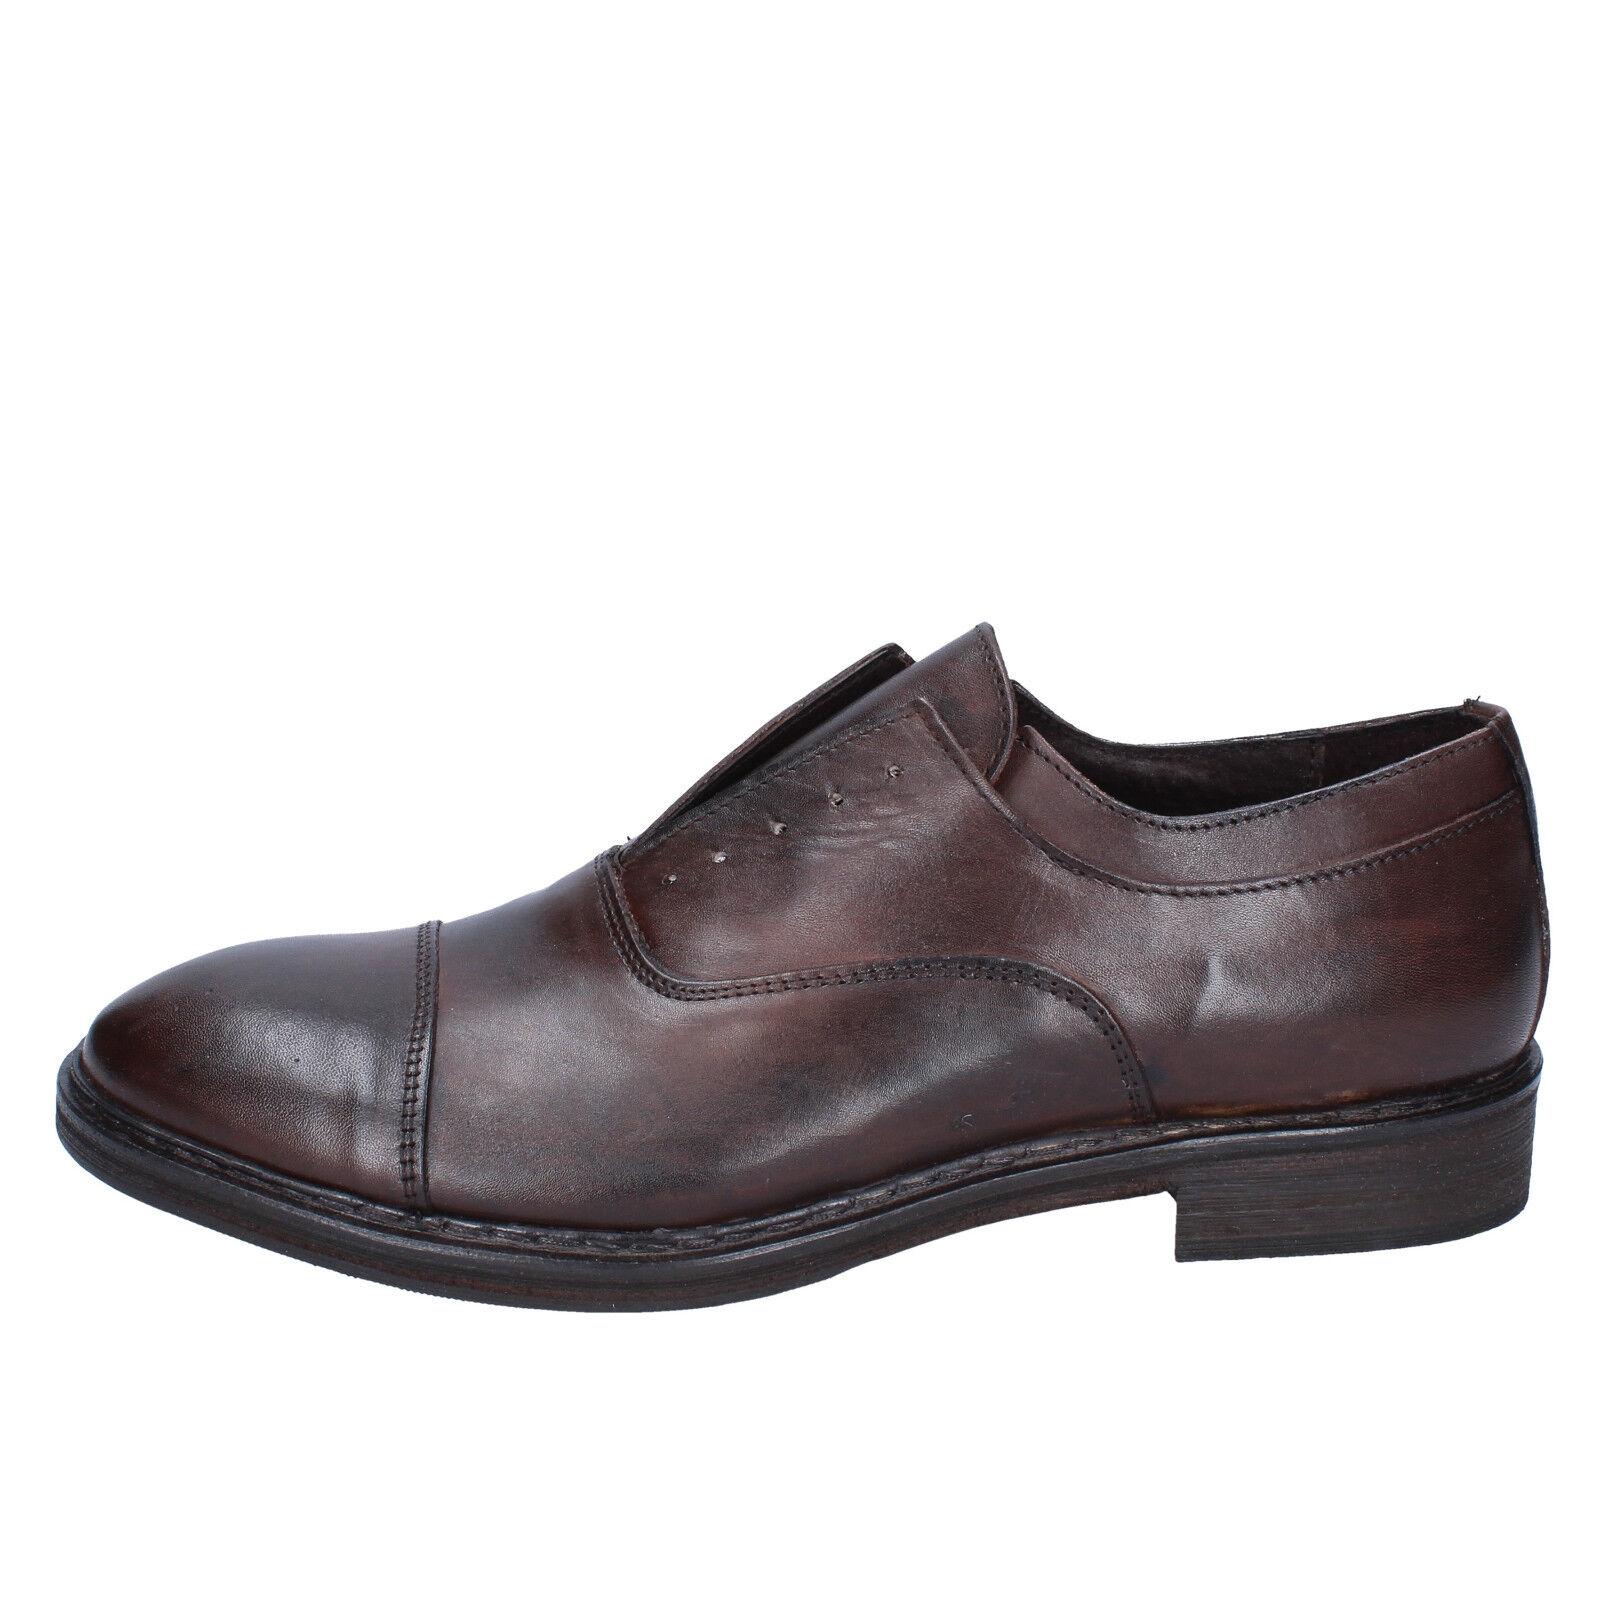 Zapatos EU CESARE hombre CESARE EU MAURIZI 43 EU Zapatos classiche marrone 1fd800